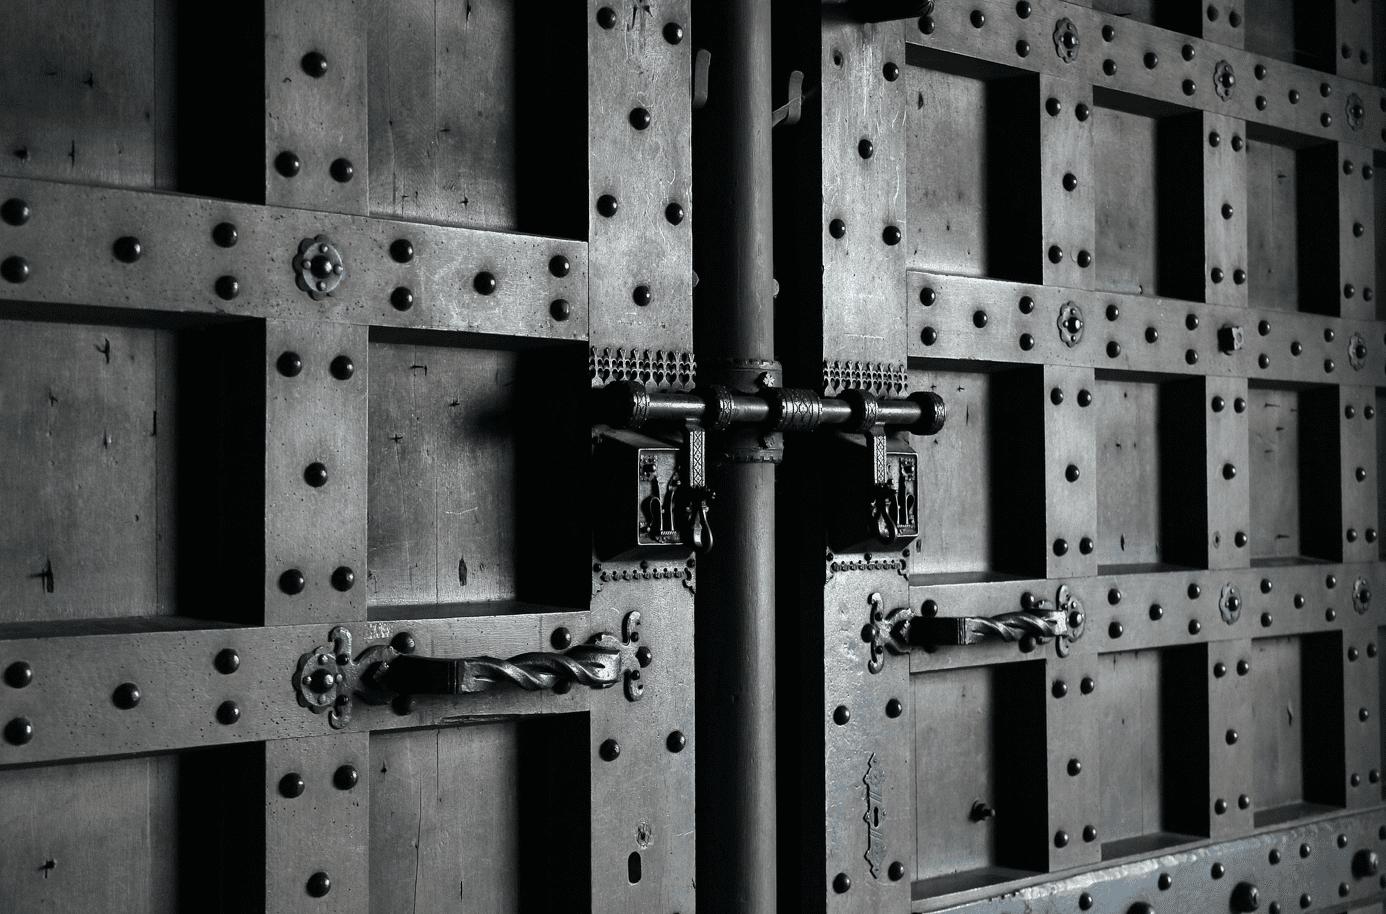 Locked metal door; image by Broesis, via Pixabay.com.